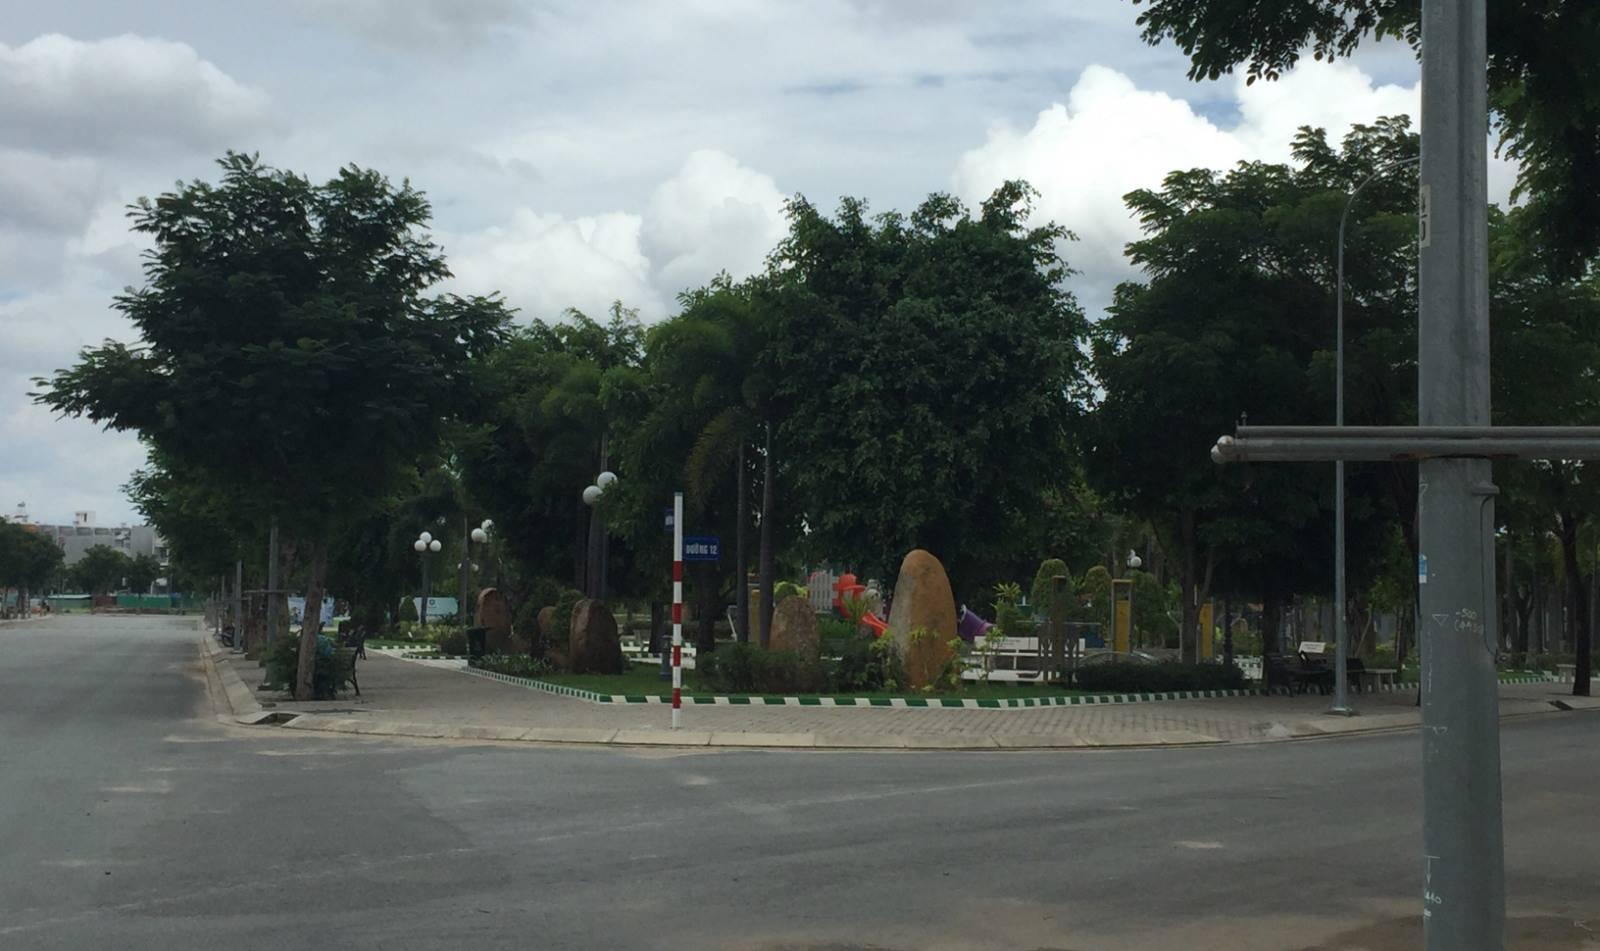 tien do thi cong du an khu do thi van phuc city moi nhat